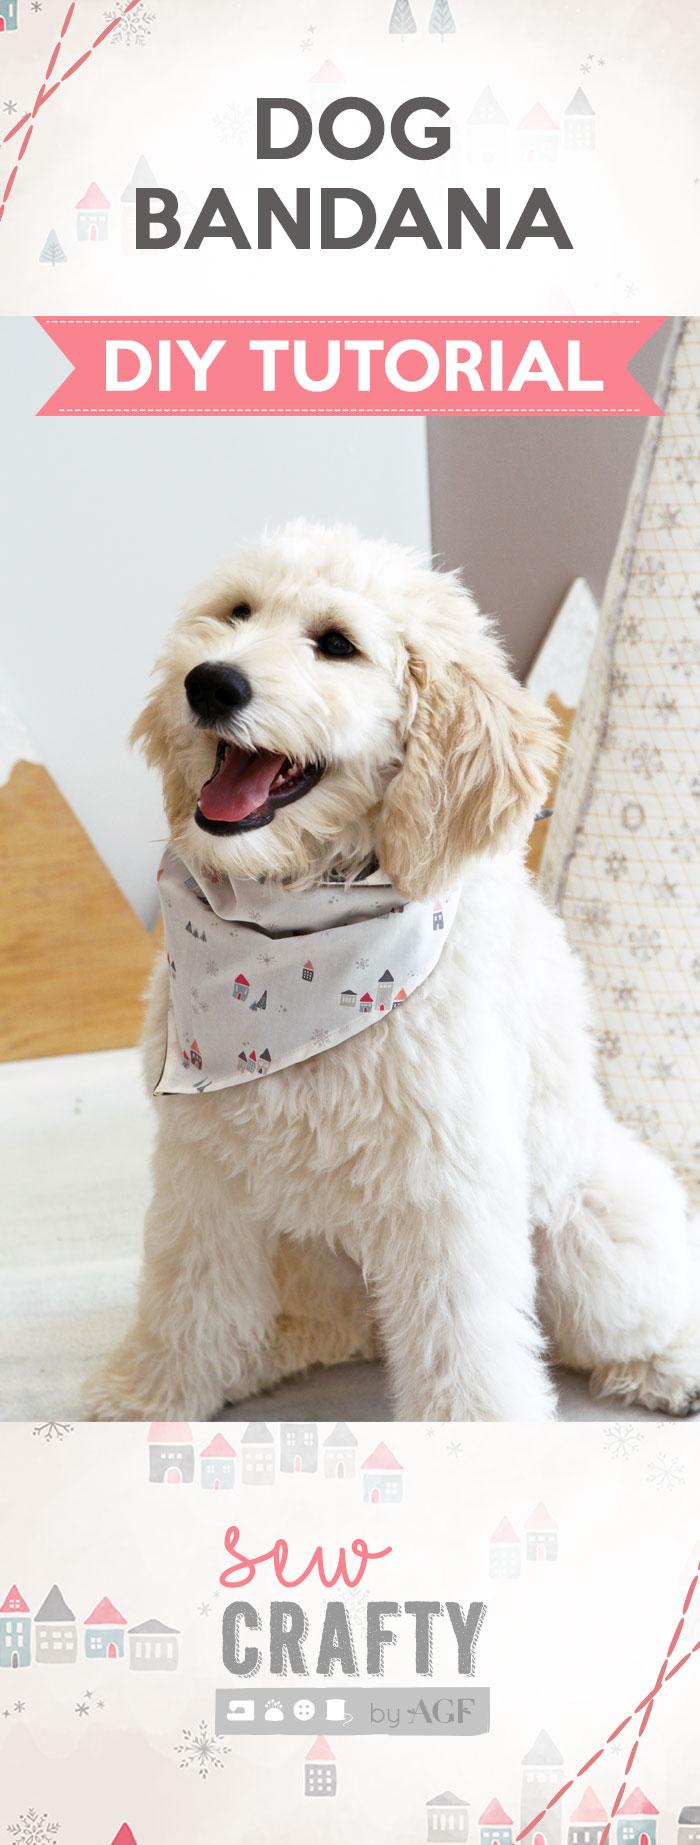 Dog-bandana-diy